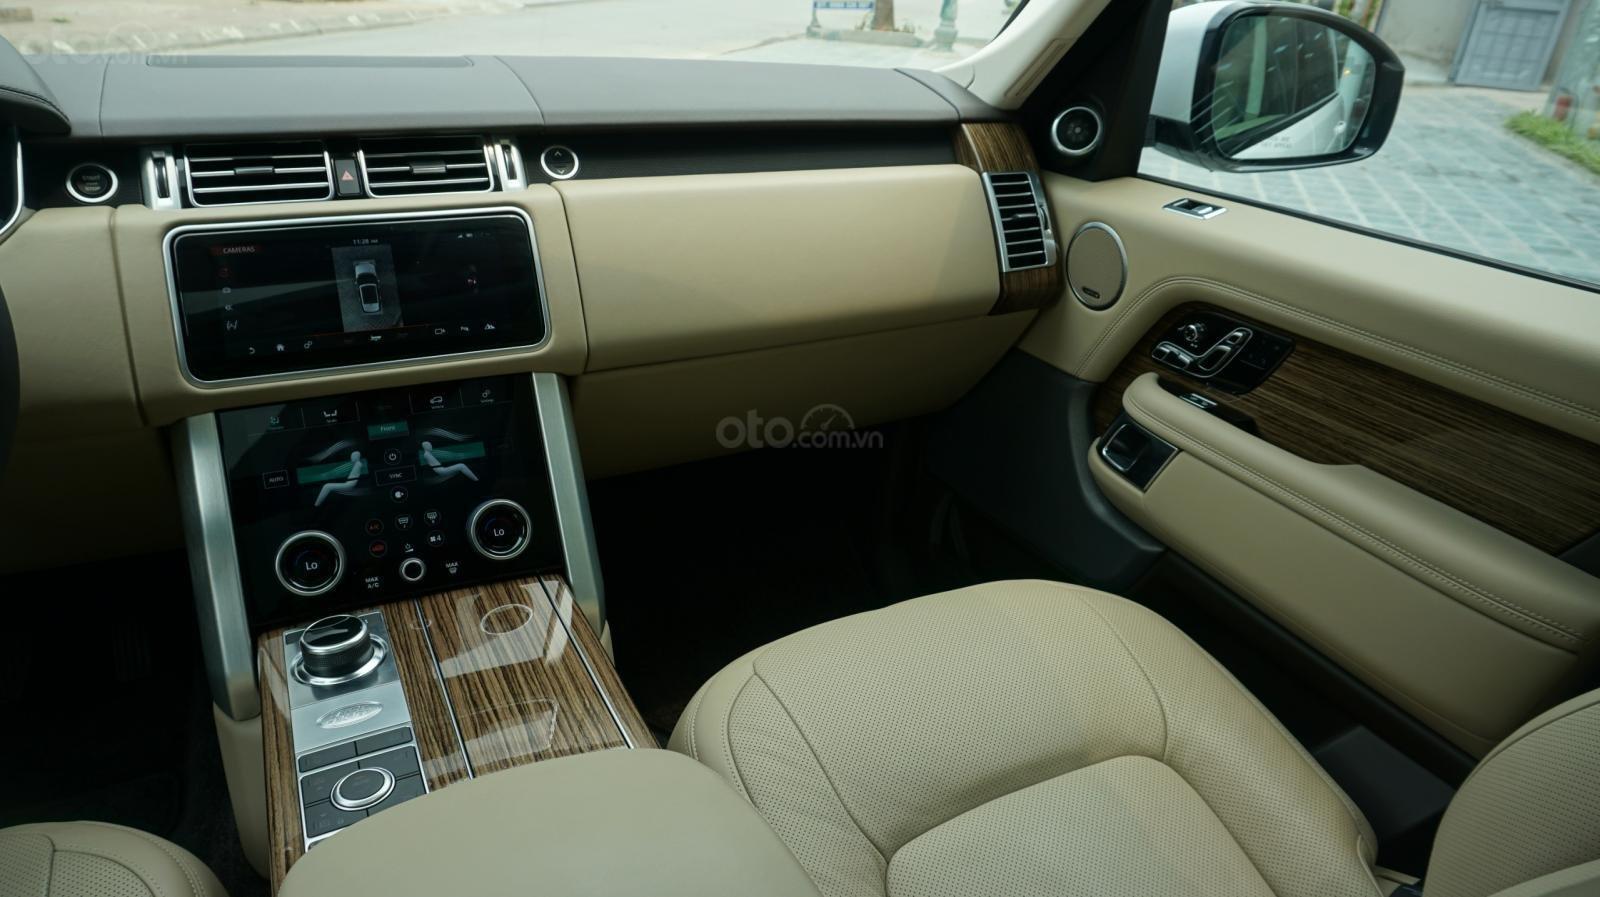 Cần bán xe LandRover Range Rover HSE năm 2019, màu trắng, xe nhập-23